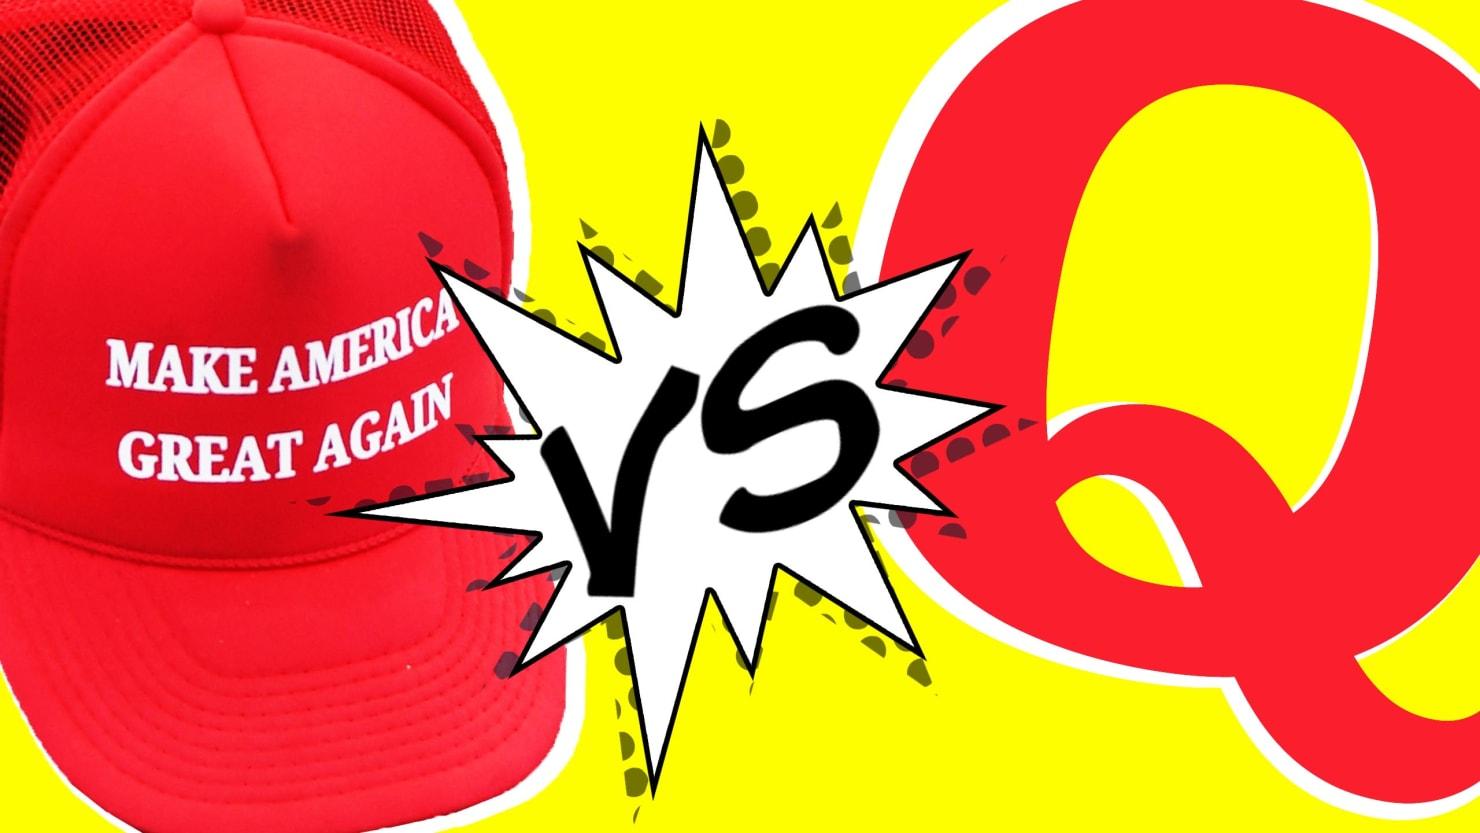 Trump's Allies Struggle to Stop QAnon's Spread